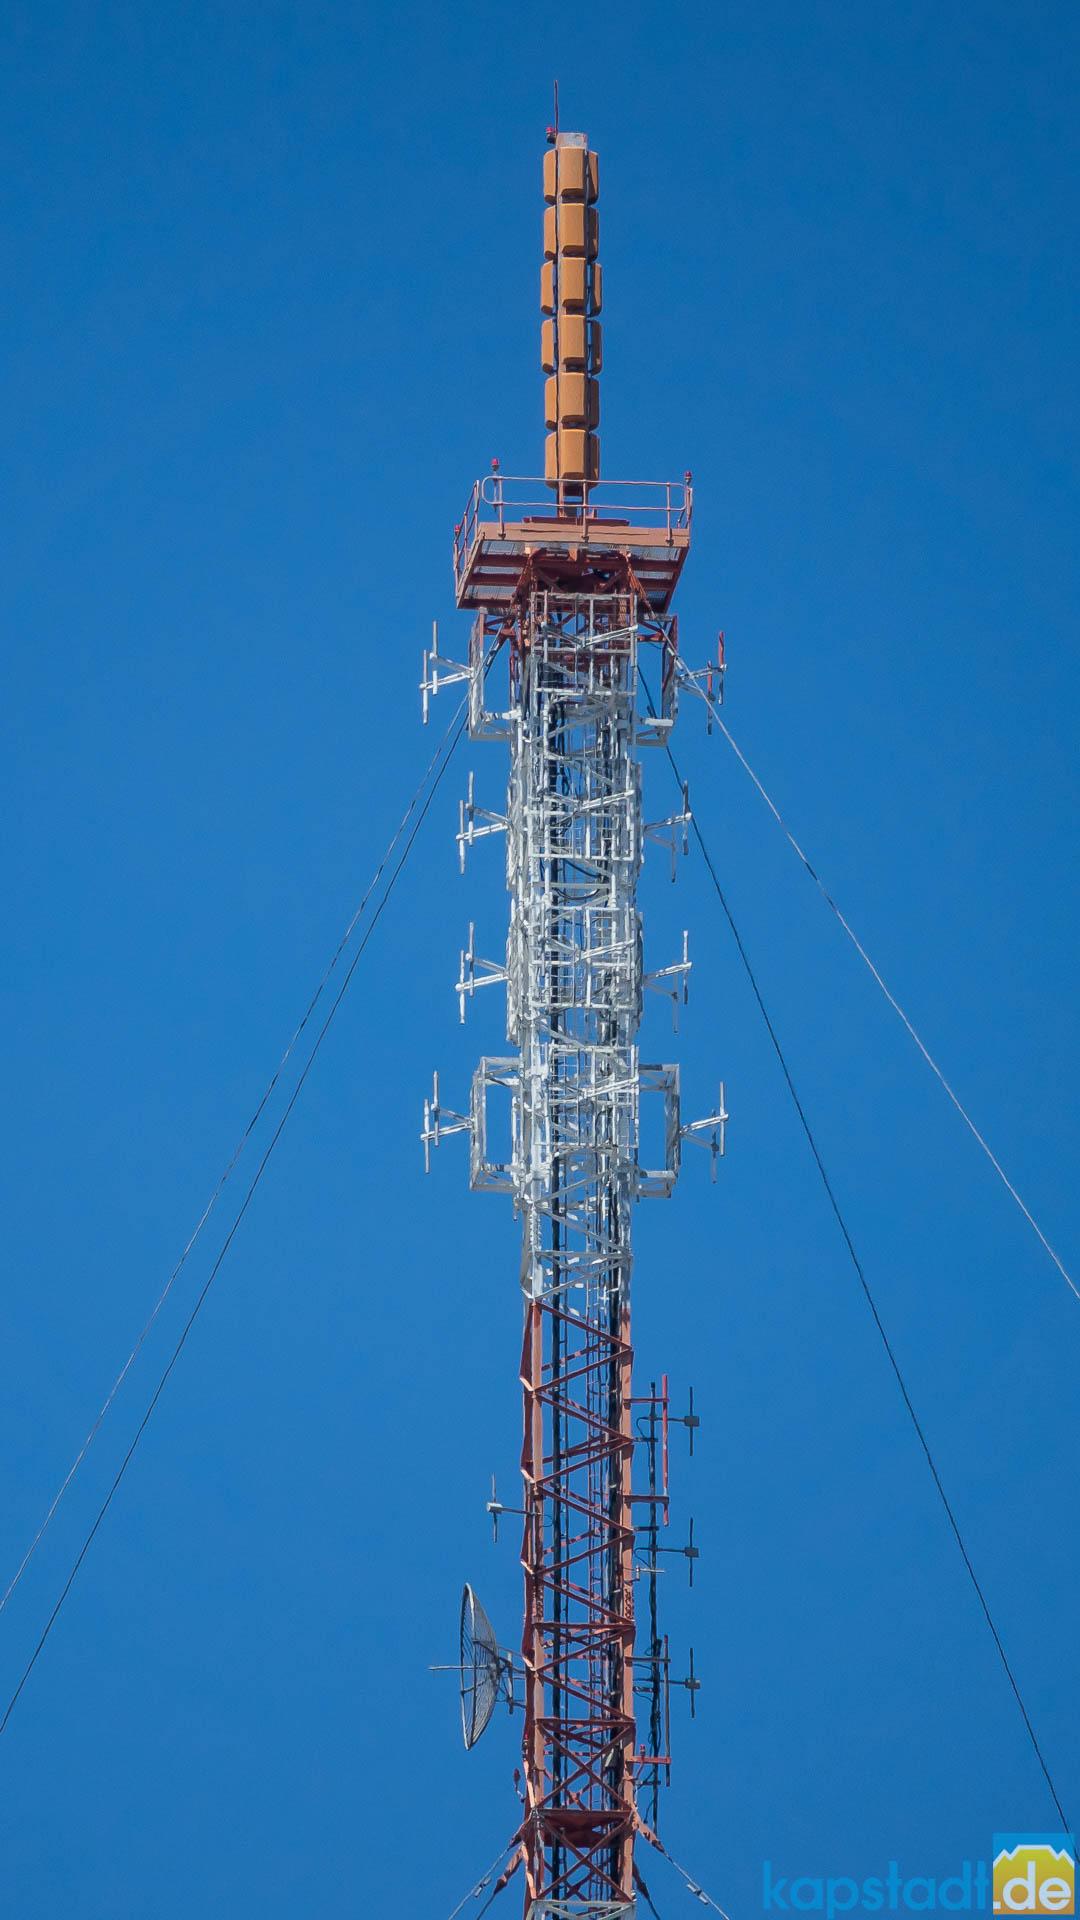 Tygerberg antennas (between Plattekloof and Durbanville)